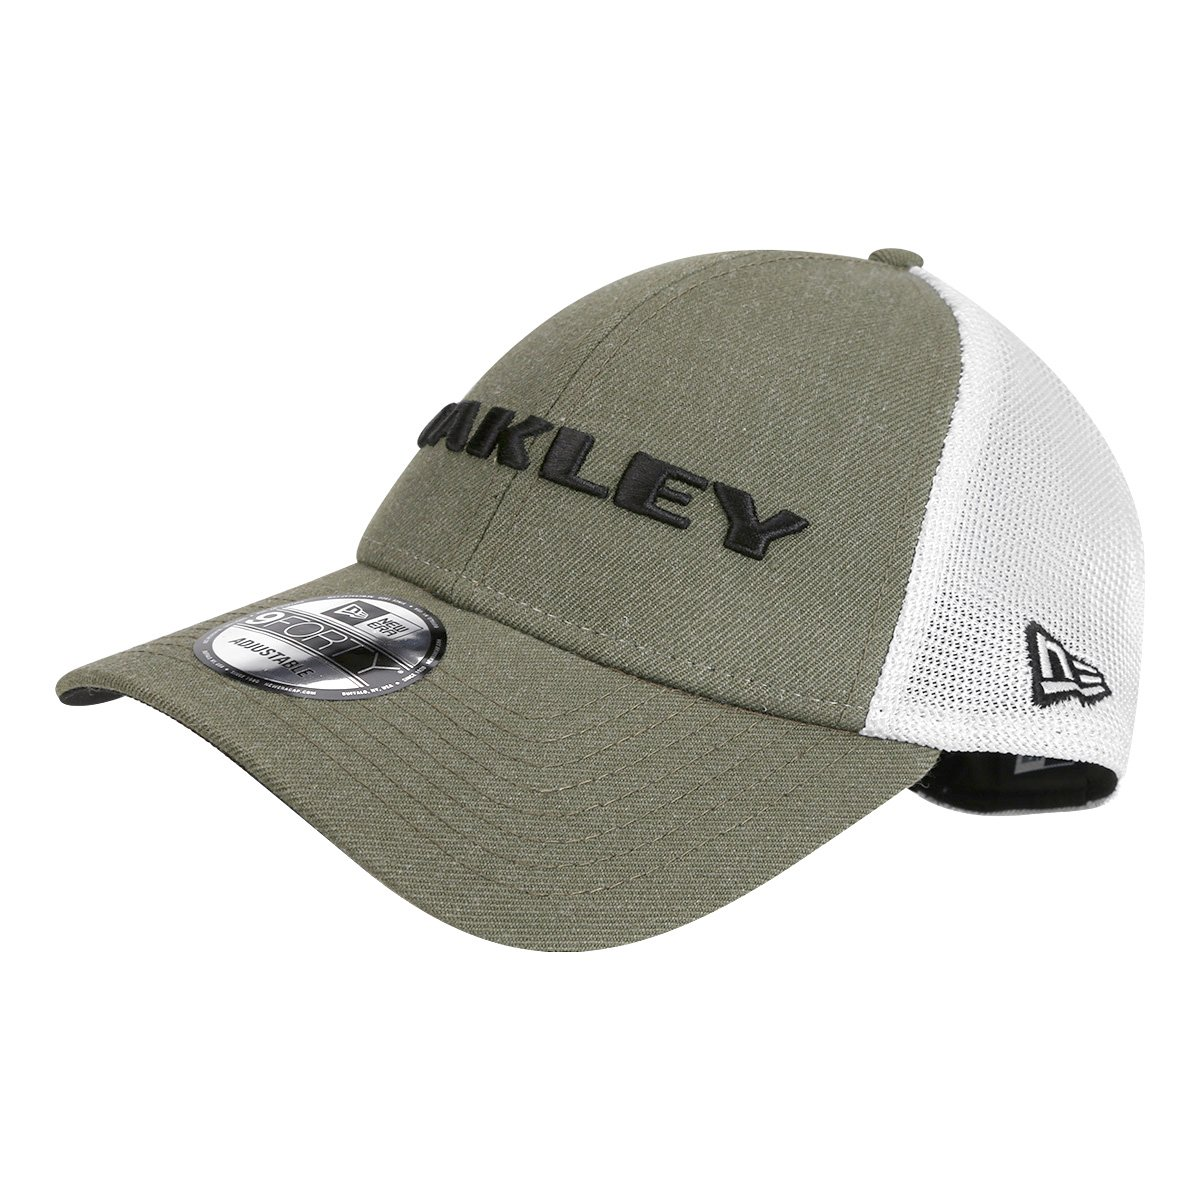 Boné Oakley Aba Curva Mod Heather New Era Masculino - Musgo e Branco - Compre  Agora  4ed9c0a3b64